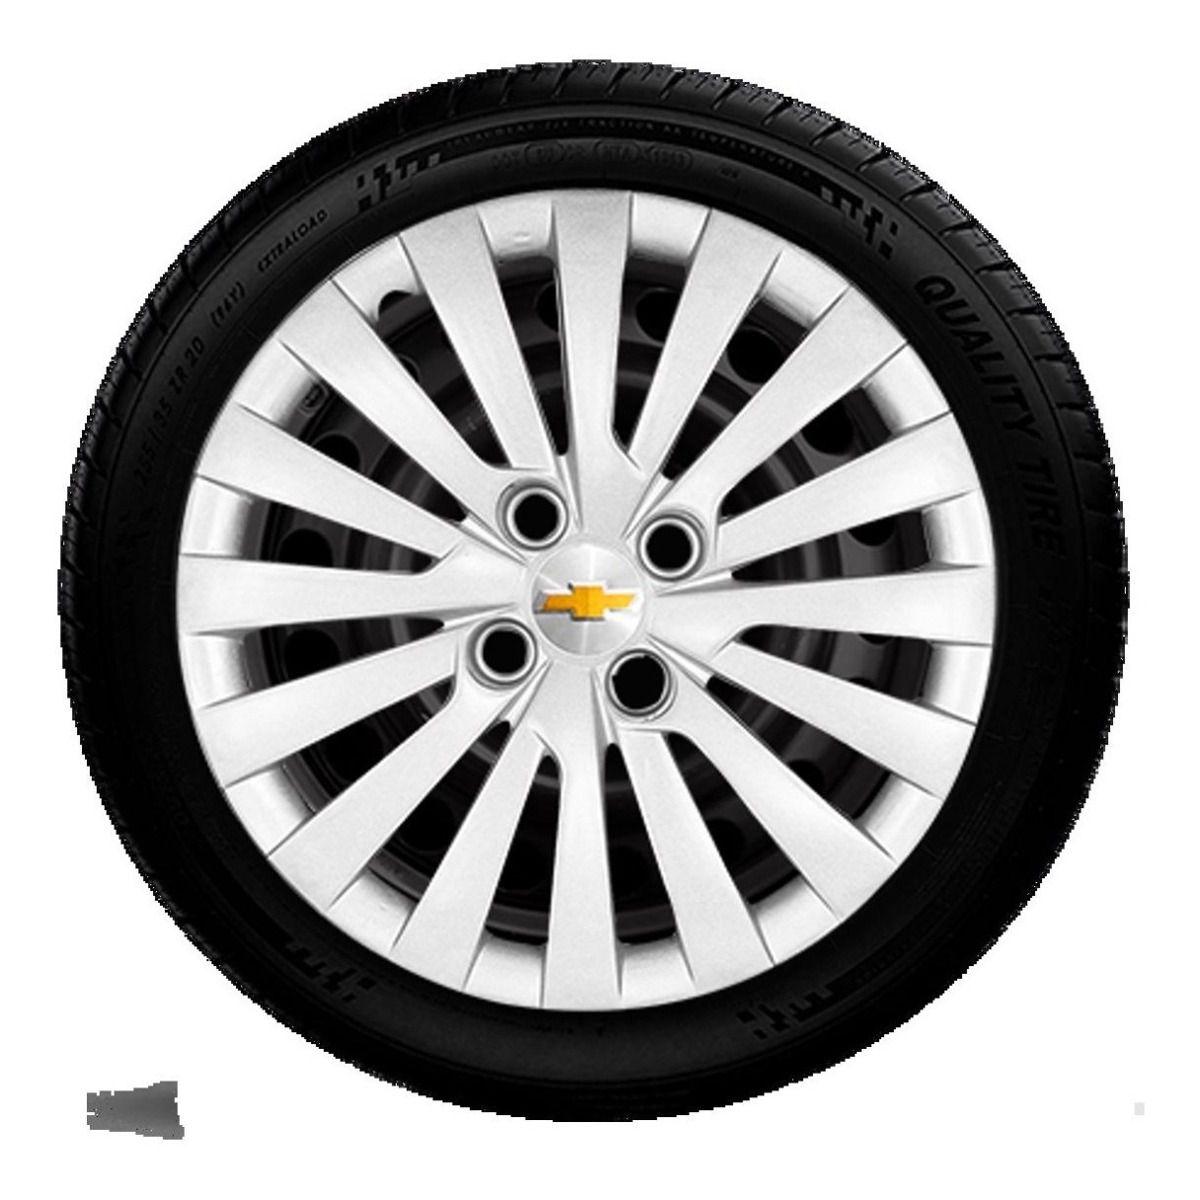 Calota Aro 14 Chevrolet Corsa Celta Onix G117j